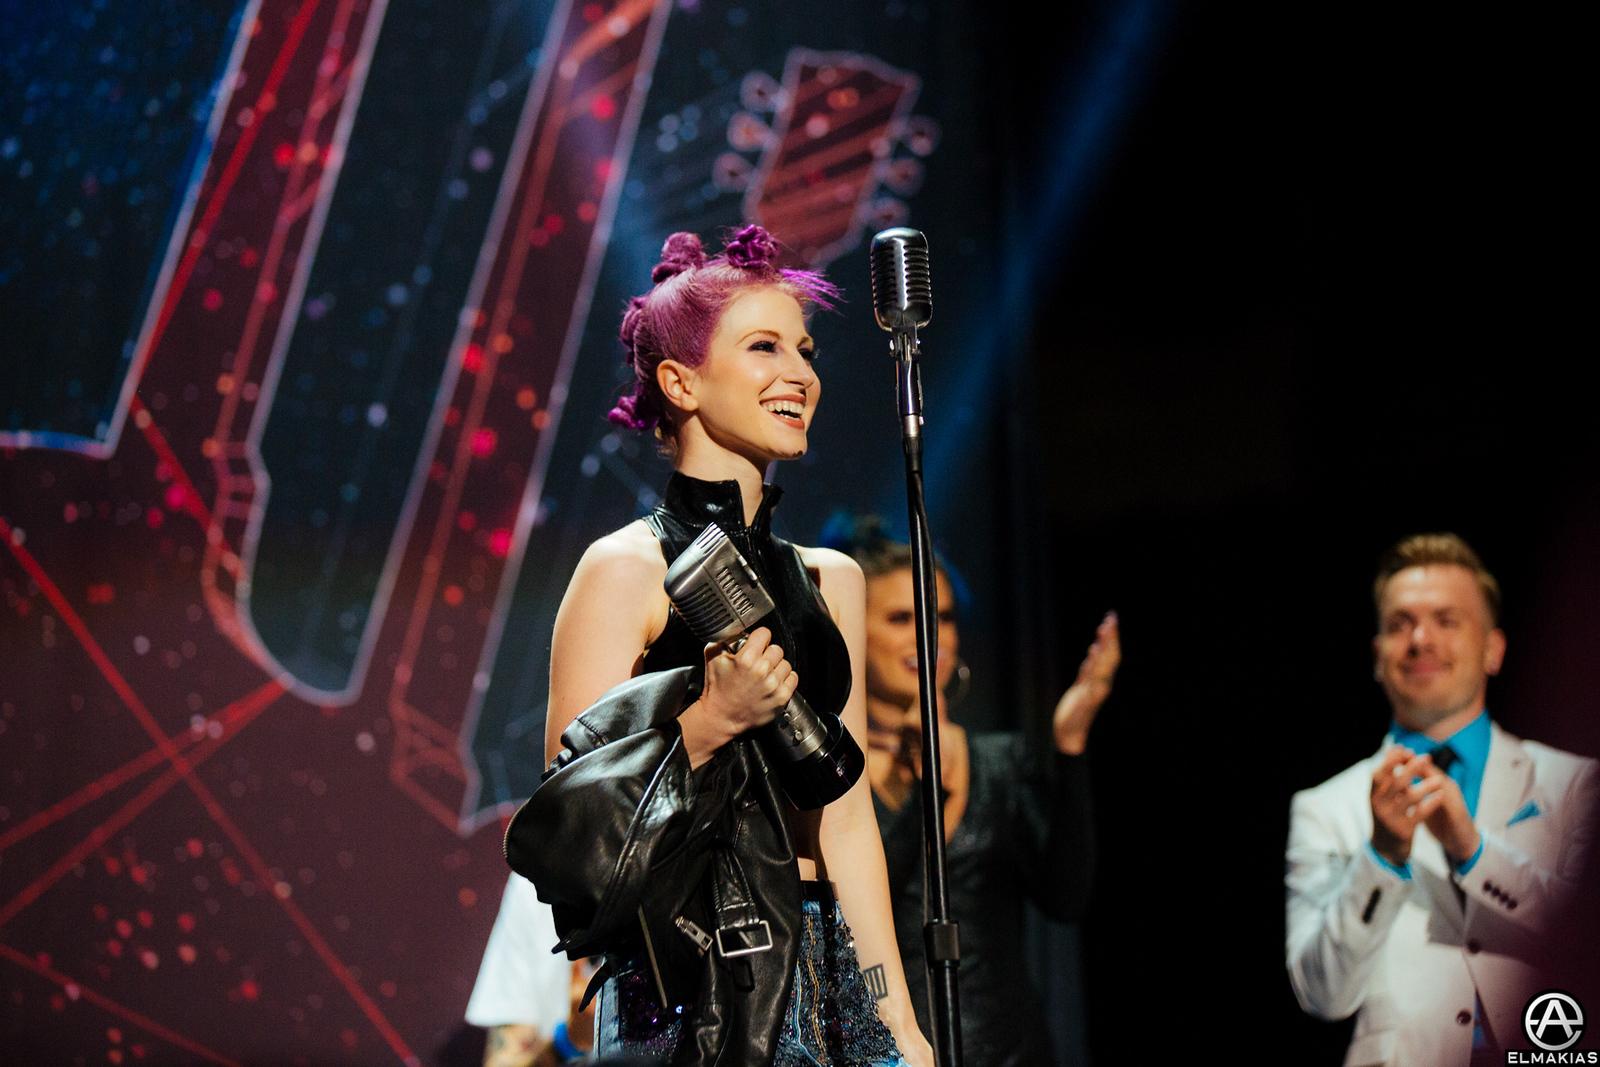 Hayley Williams of Paramore - Best Vocalist at the APMAs 2015 by Adam Elmakias